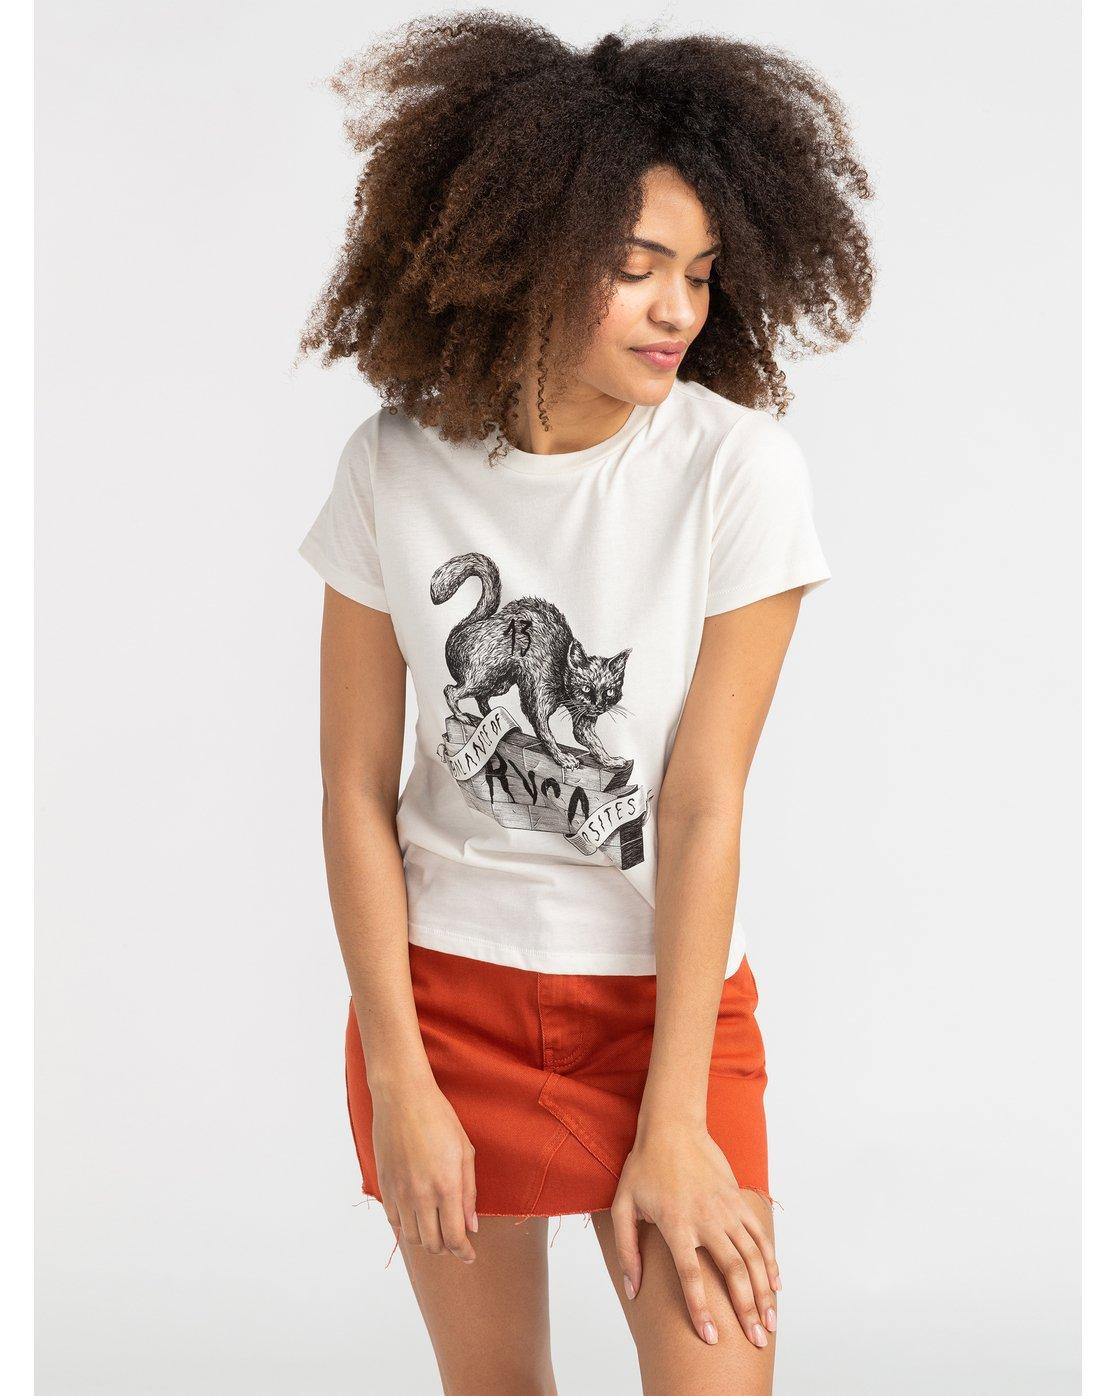 0 Benjamin Jeanjean Benjamin - T-Shirt for T-Shirt White S3SSRERVP0 RVCA